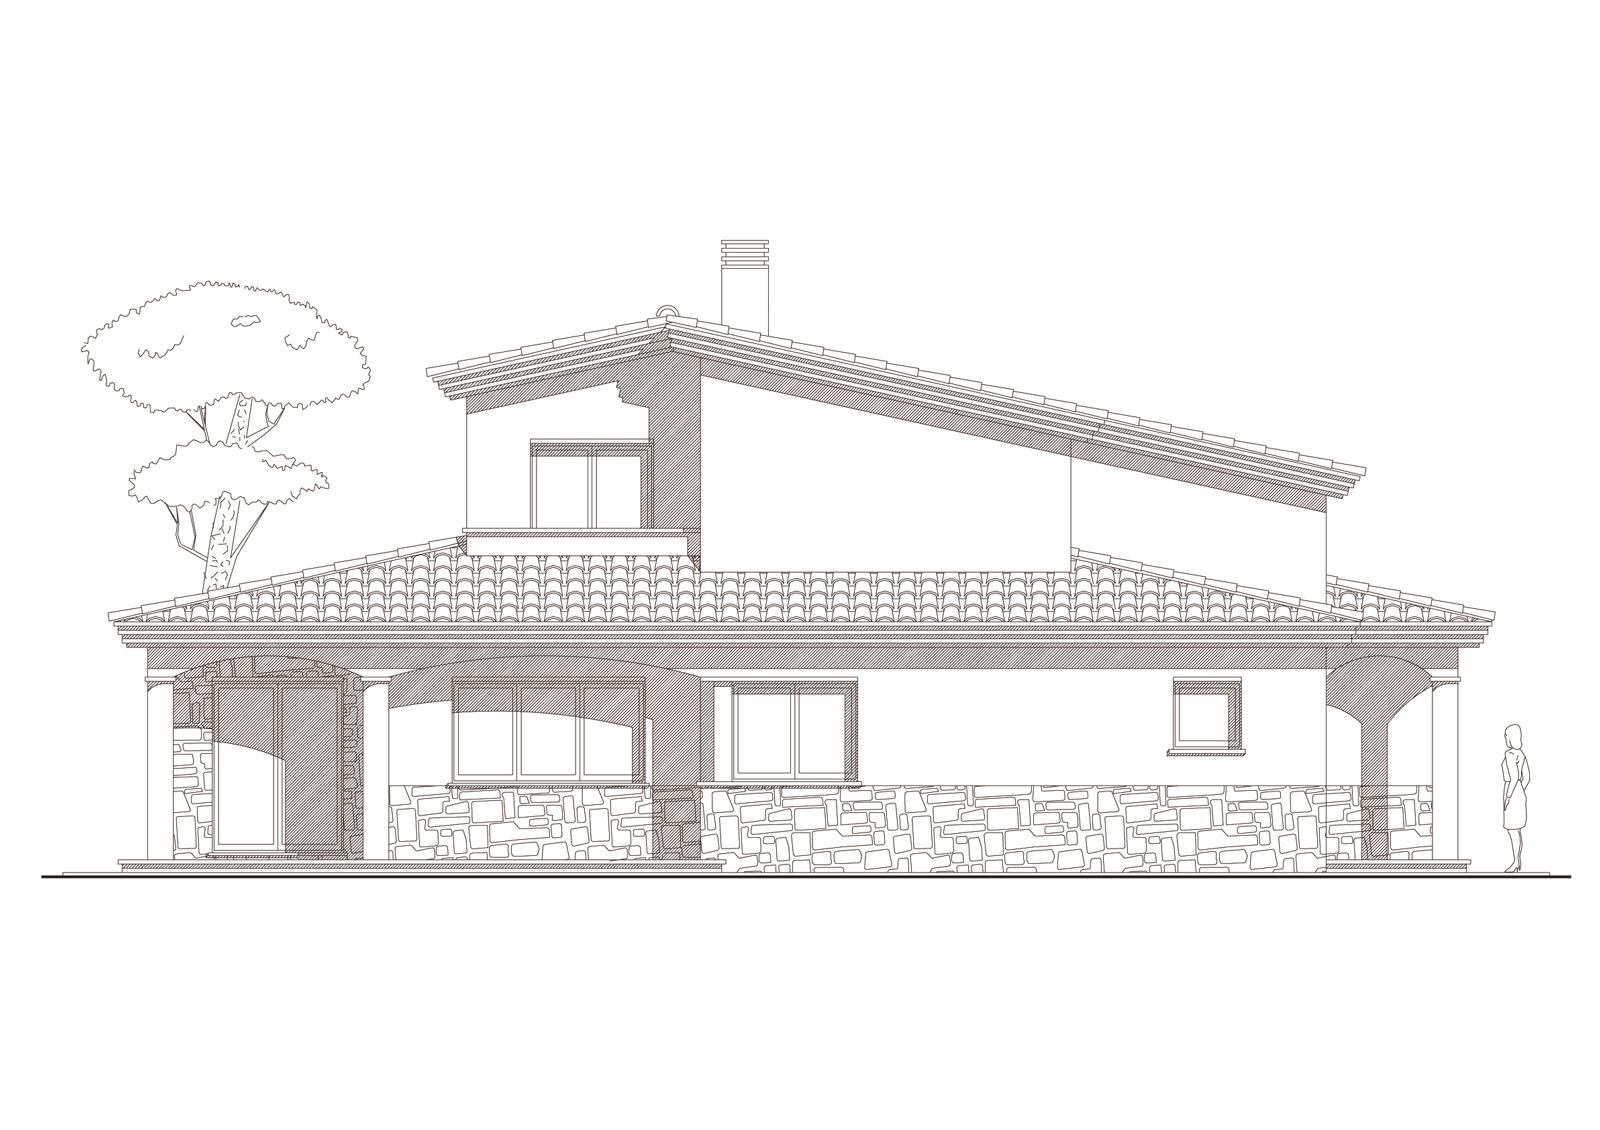 Alçat sud. Projecte d'obra nova: 1998 Habitatge unifamiliar aïllat